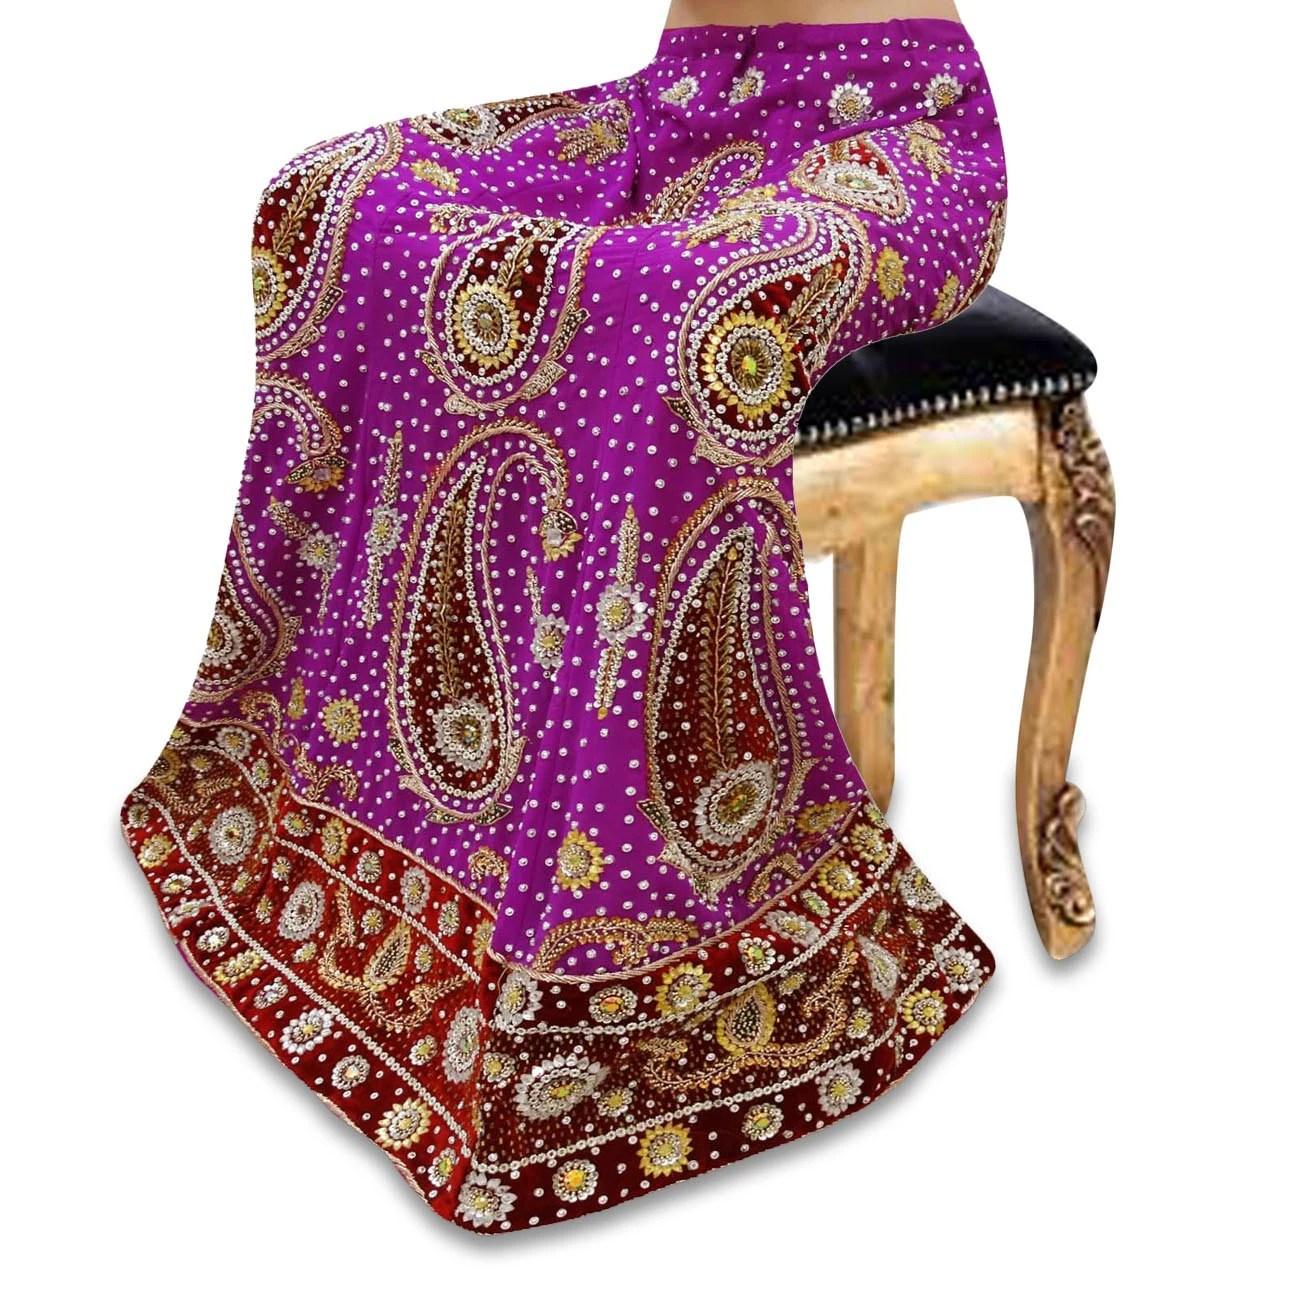 Indian Wedding Skirt Vintage Style New Bridal Purple